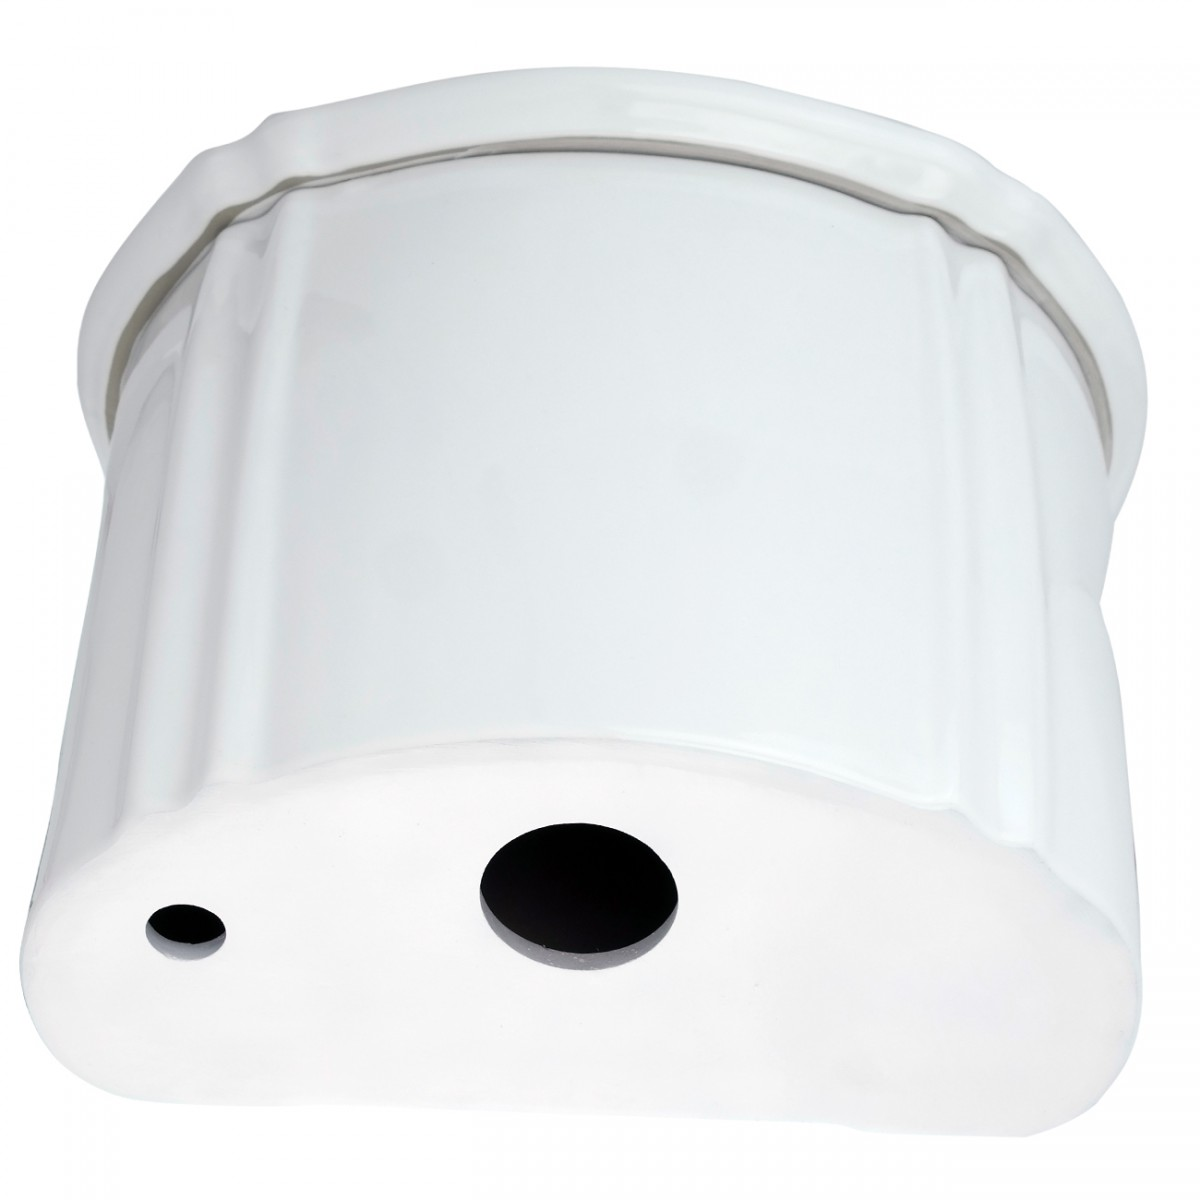 Renovators Supply White Ceramic High Tank Pull Chain Toilet Elongated Bowl High Tank Pull Chain Toilets High Tank Toilet with Elongated Bowl Old Fashioned Toilet